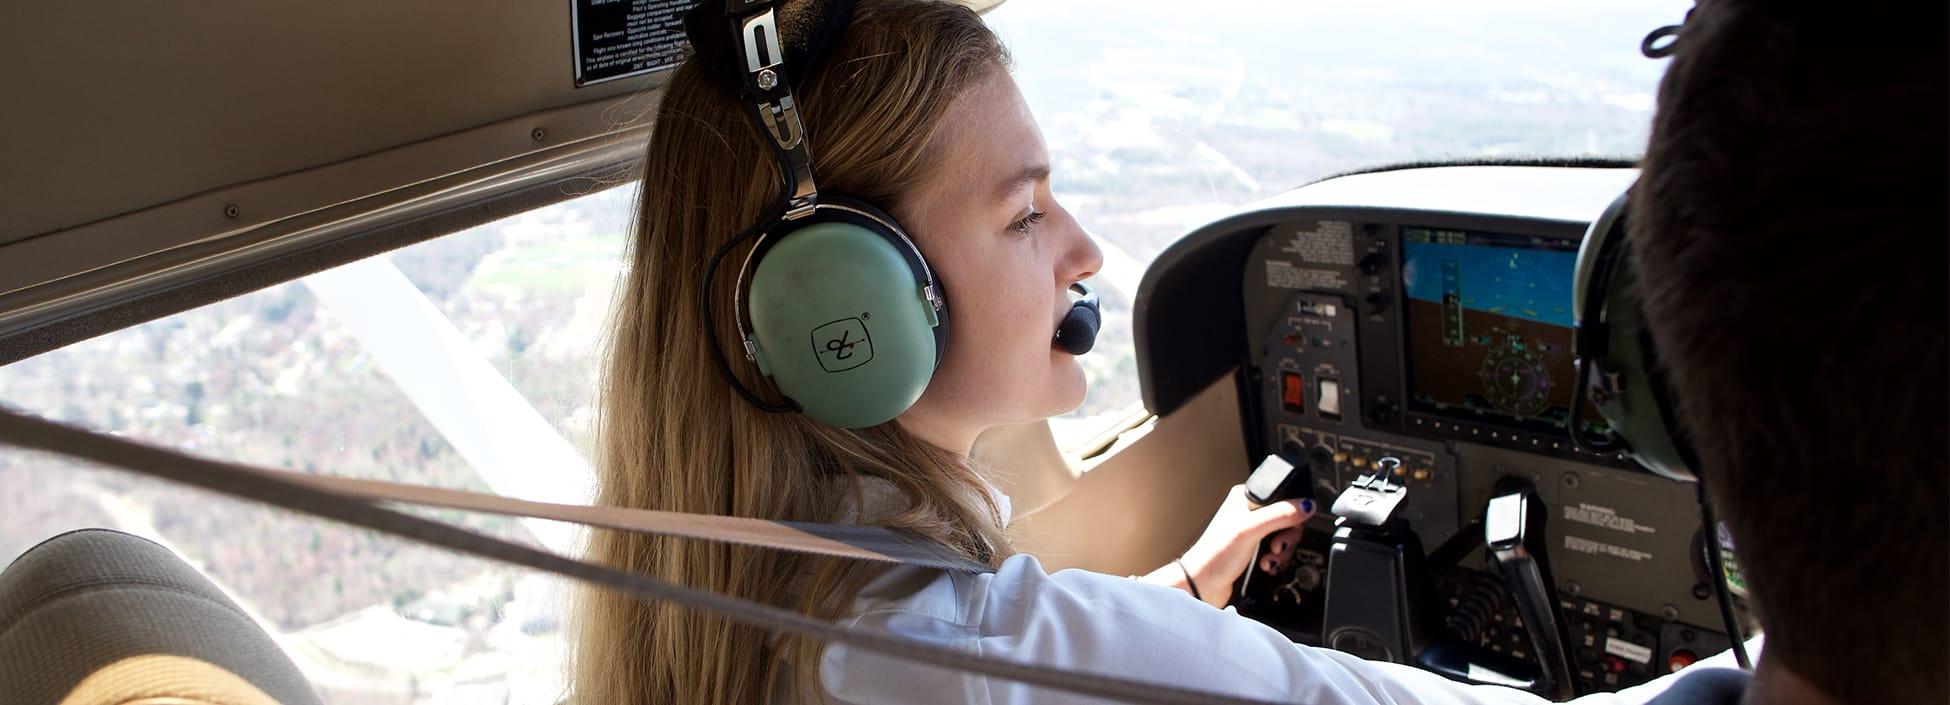 A female student adjusts controls on a plane dashboard as she soars above the Burlington area, professional pilot technology, pilot, STEM, hands on